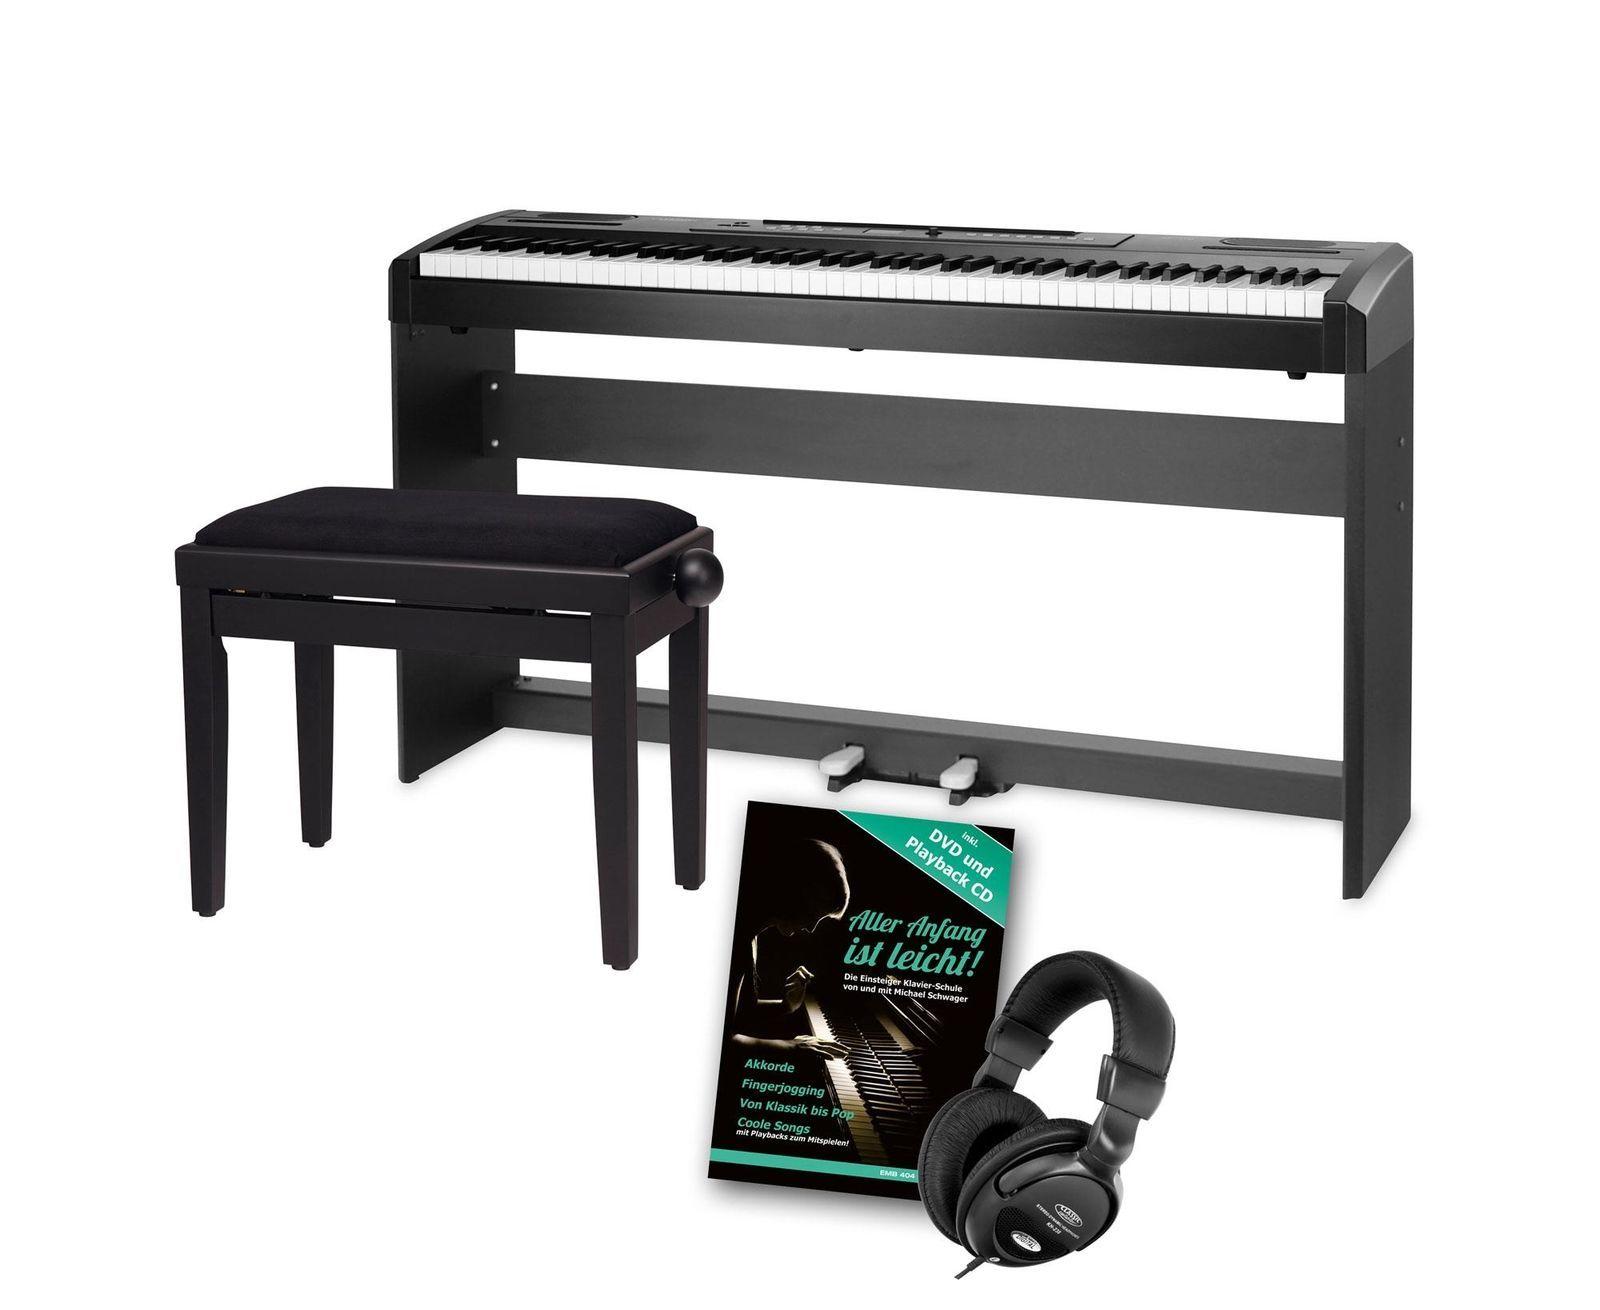 digital stage piano 88 tasten hammermechanik e piano kopfhÖrer